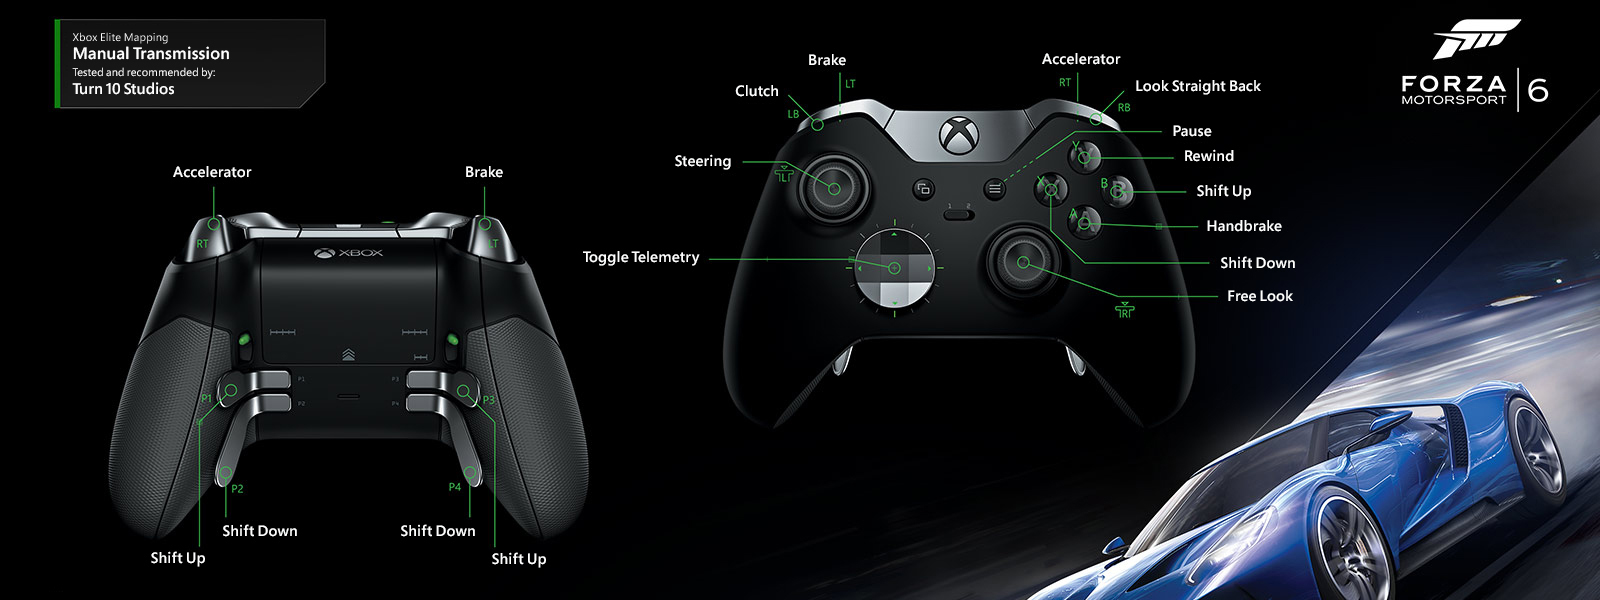 Forza Motorsport 6 – Manual Transmission Elite Mapping